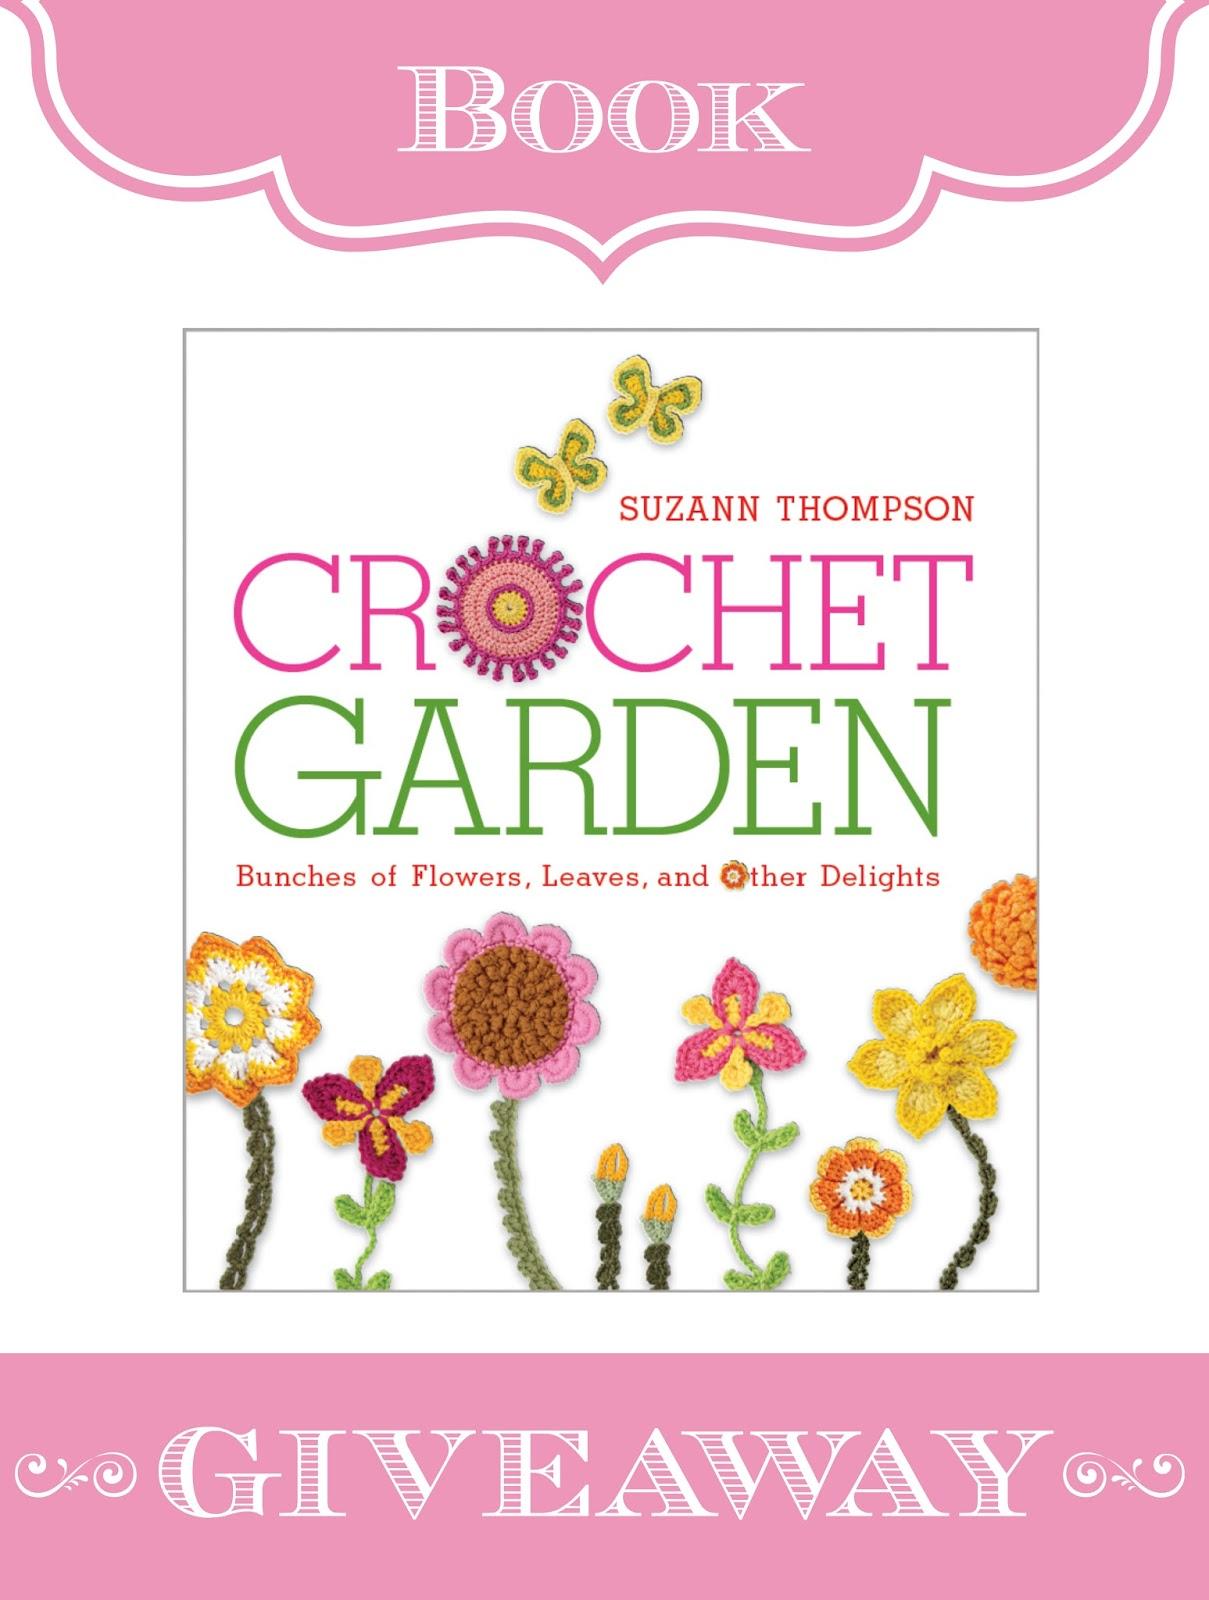 http://4.bp.blogspot.com/-RI0f2JuEO70/U9mreqVVWuI/AAAAAAAAM0w/OrI16hJF2Rc/s1600/Crochet+Garden+Book+Giveaway.jpg